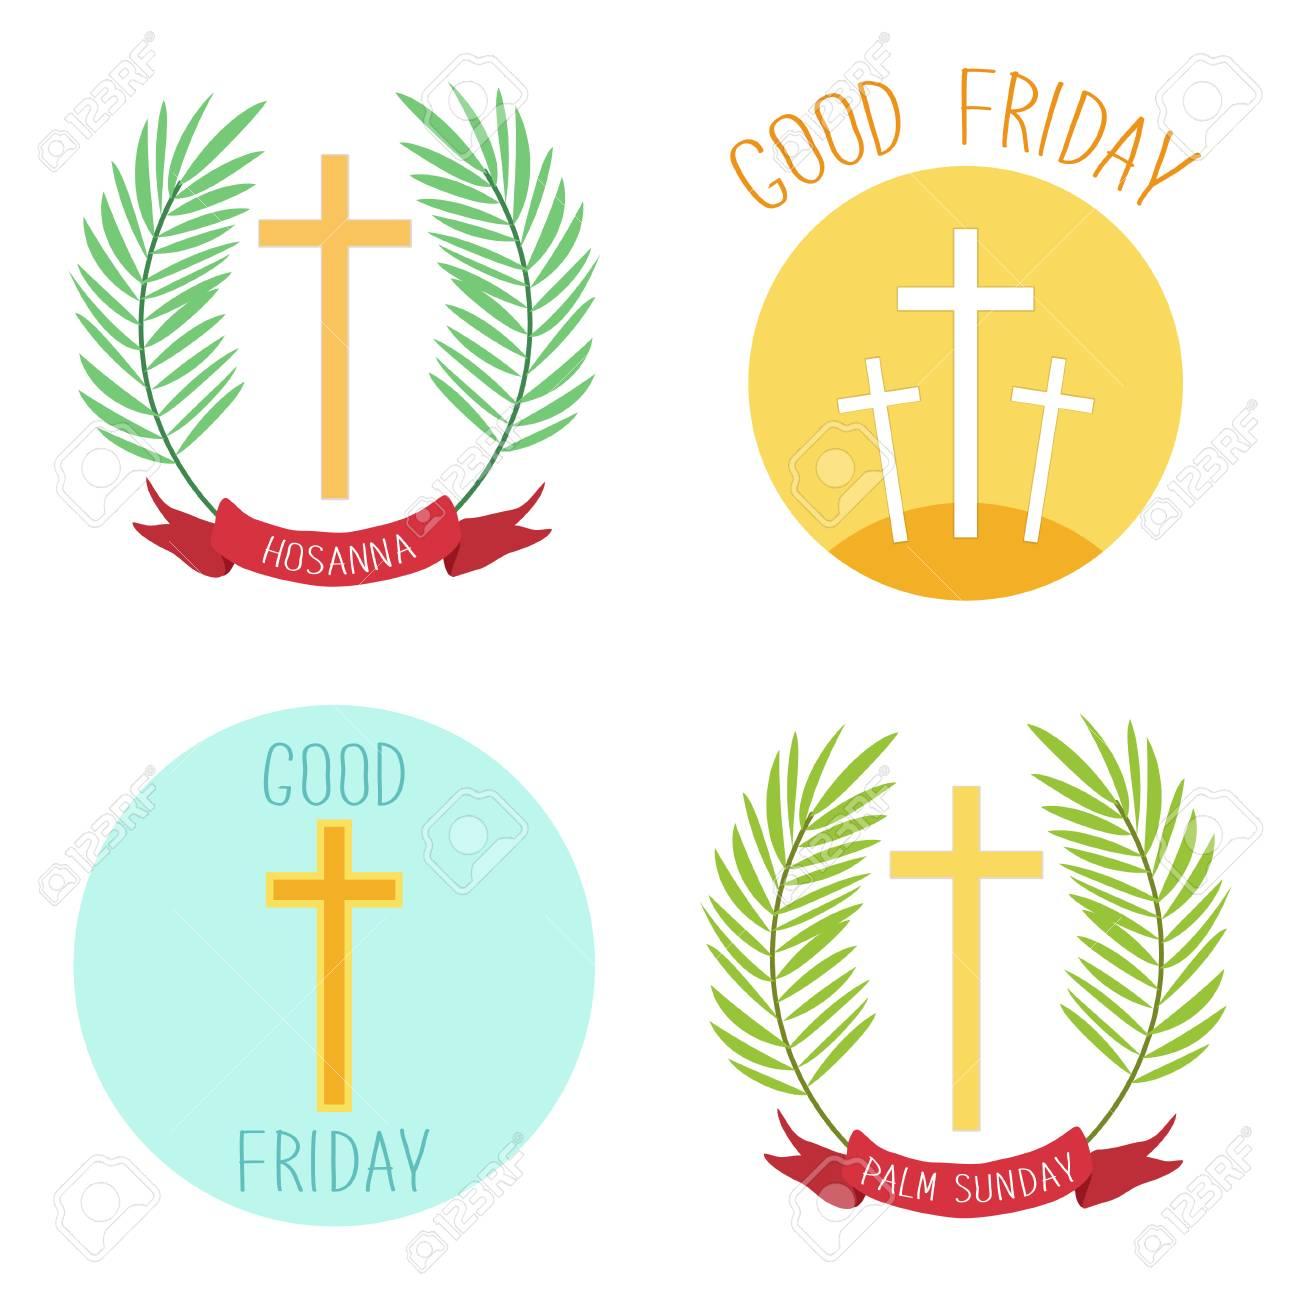 Palm Sunday and Good friday icons as religious holidays symbols - 95891252